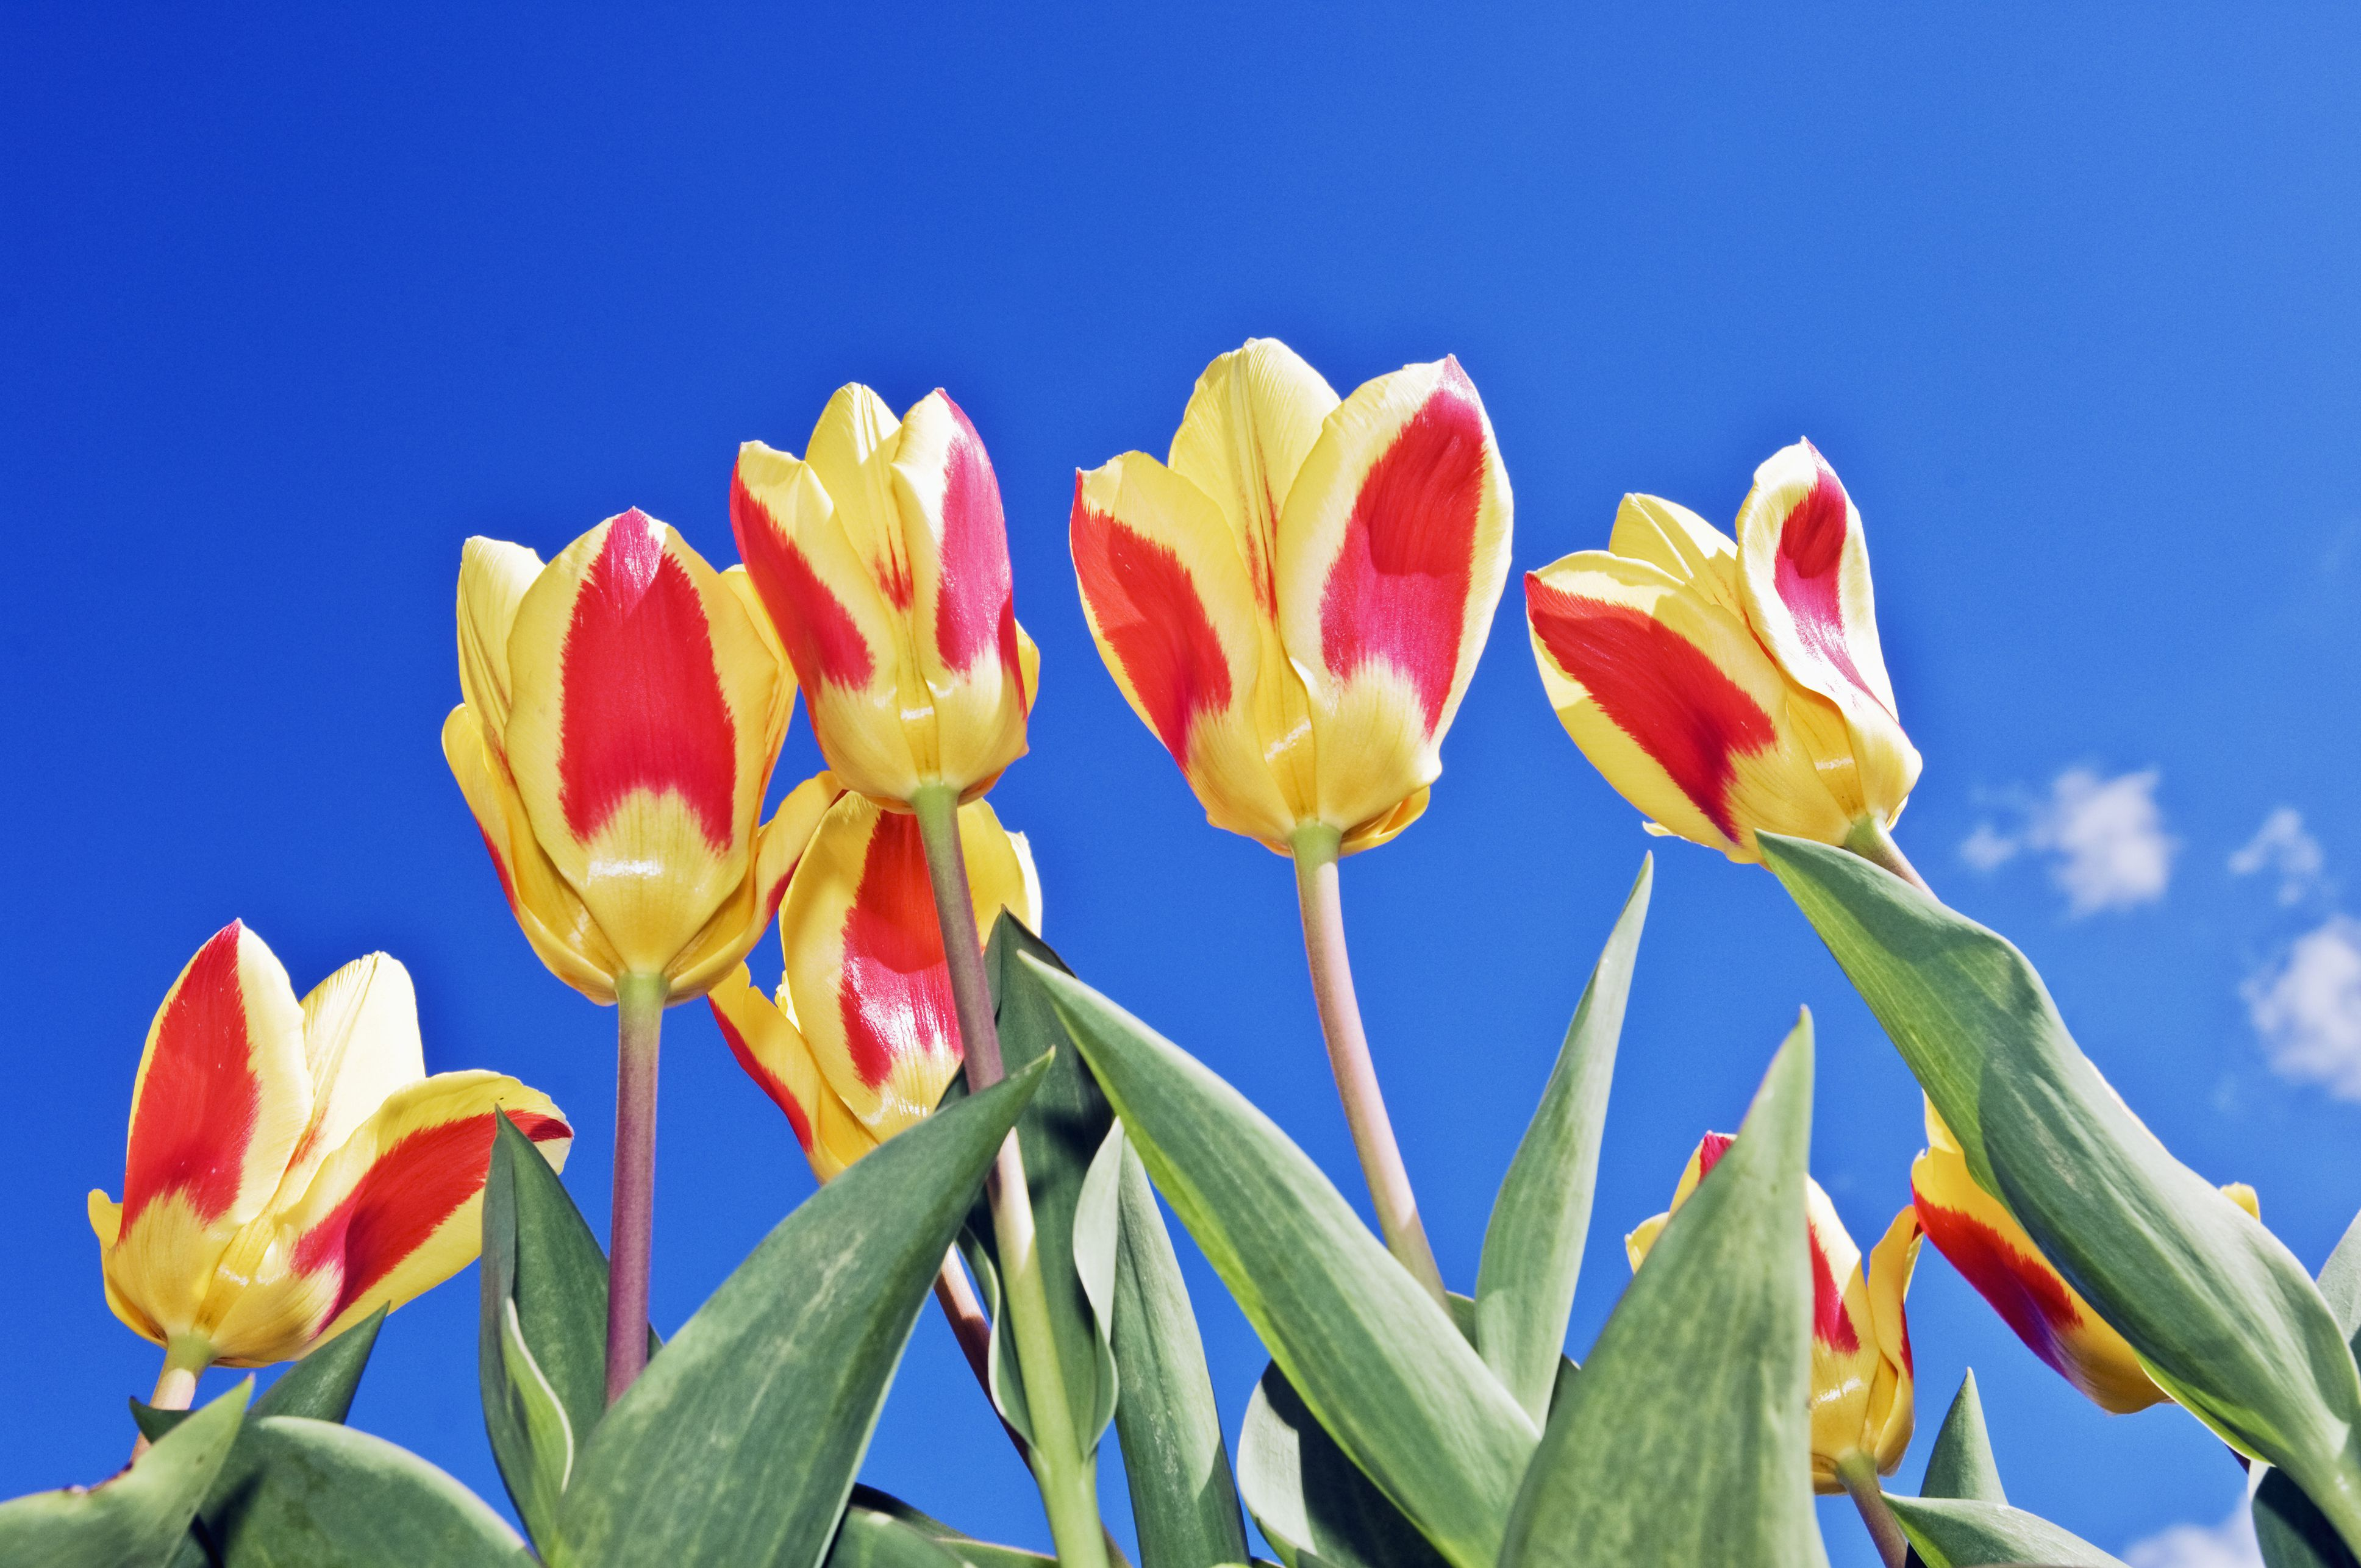 Tulips (Tulipa, syn. T. kaufmanniana) 'Stresa'